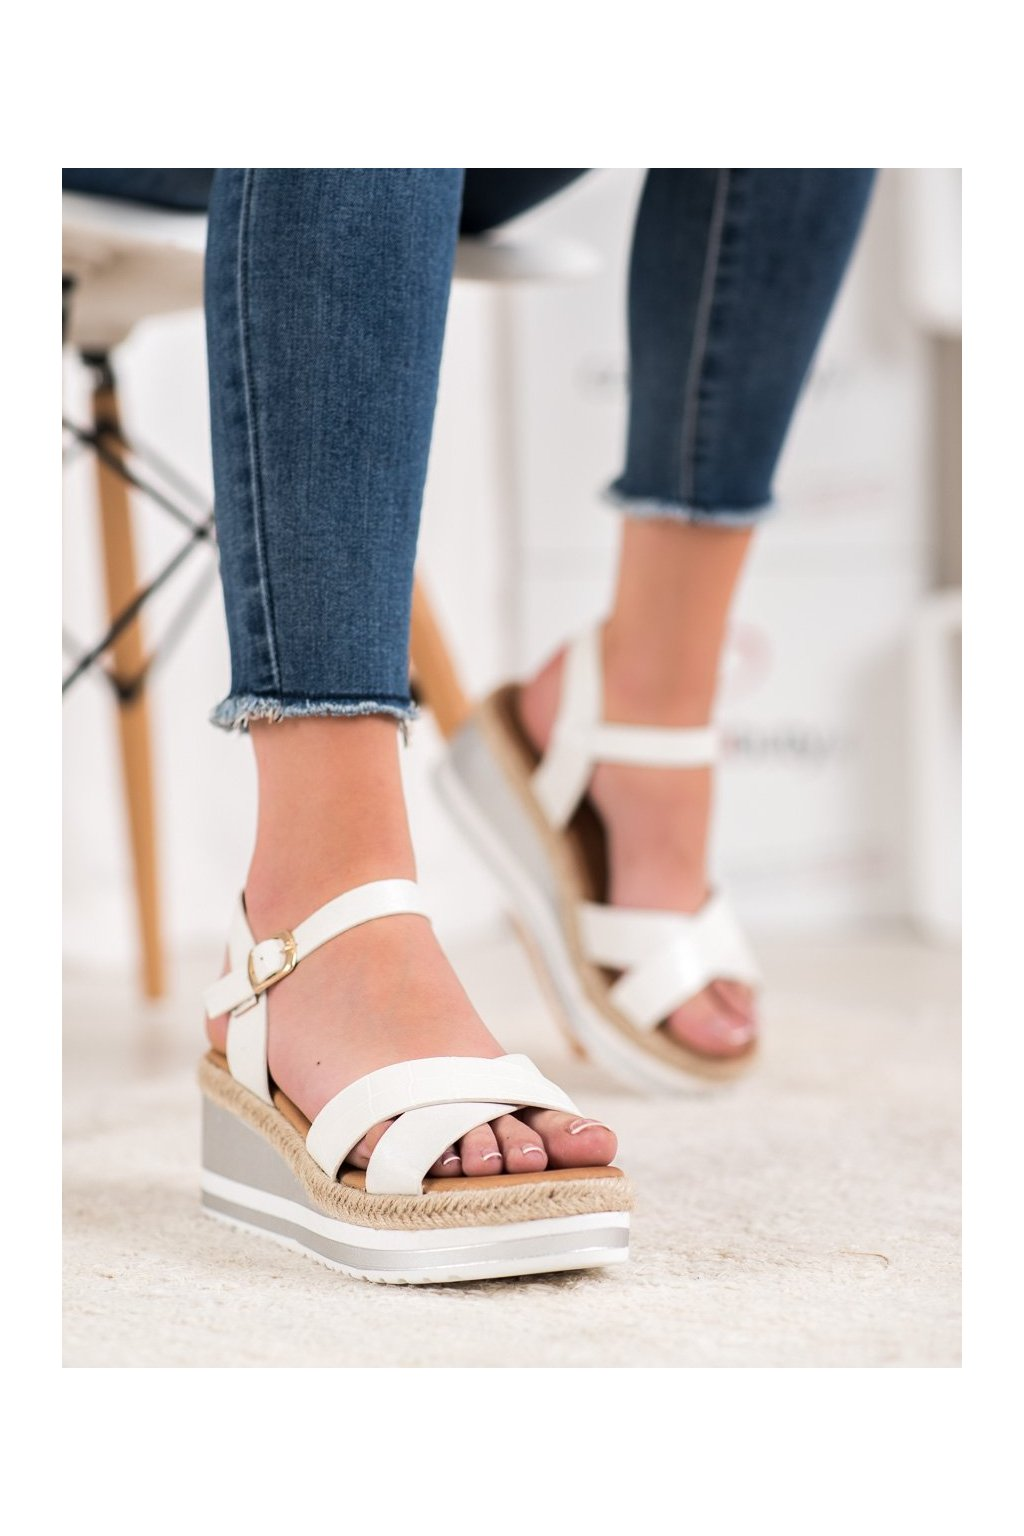 Biele sandále Weide kod Y606W